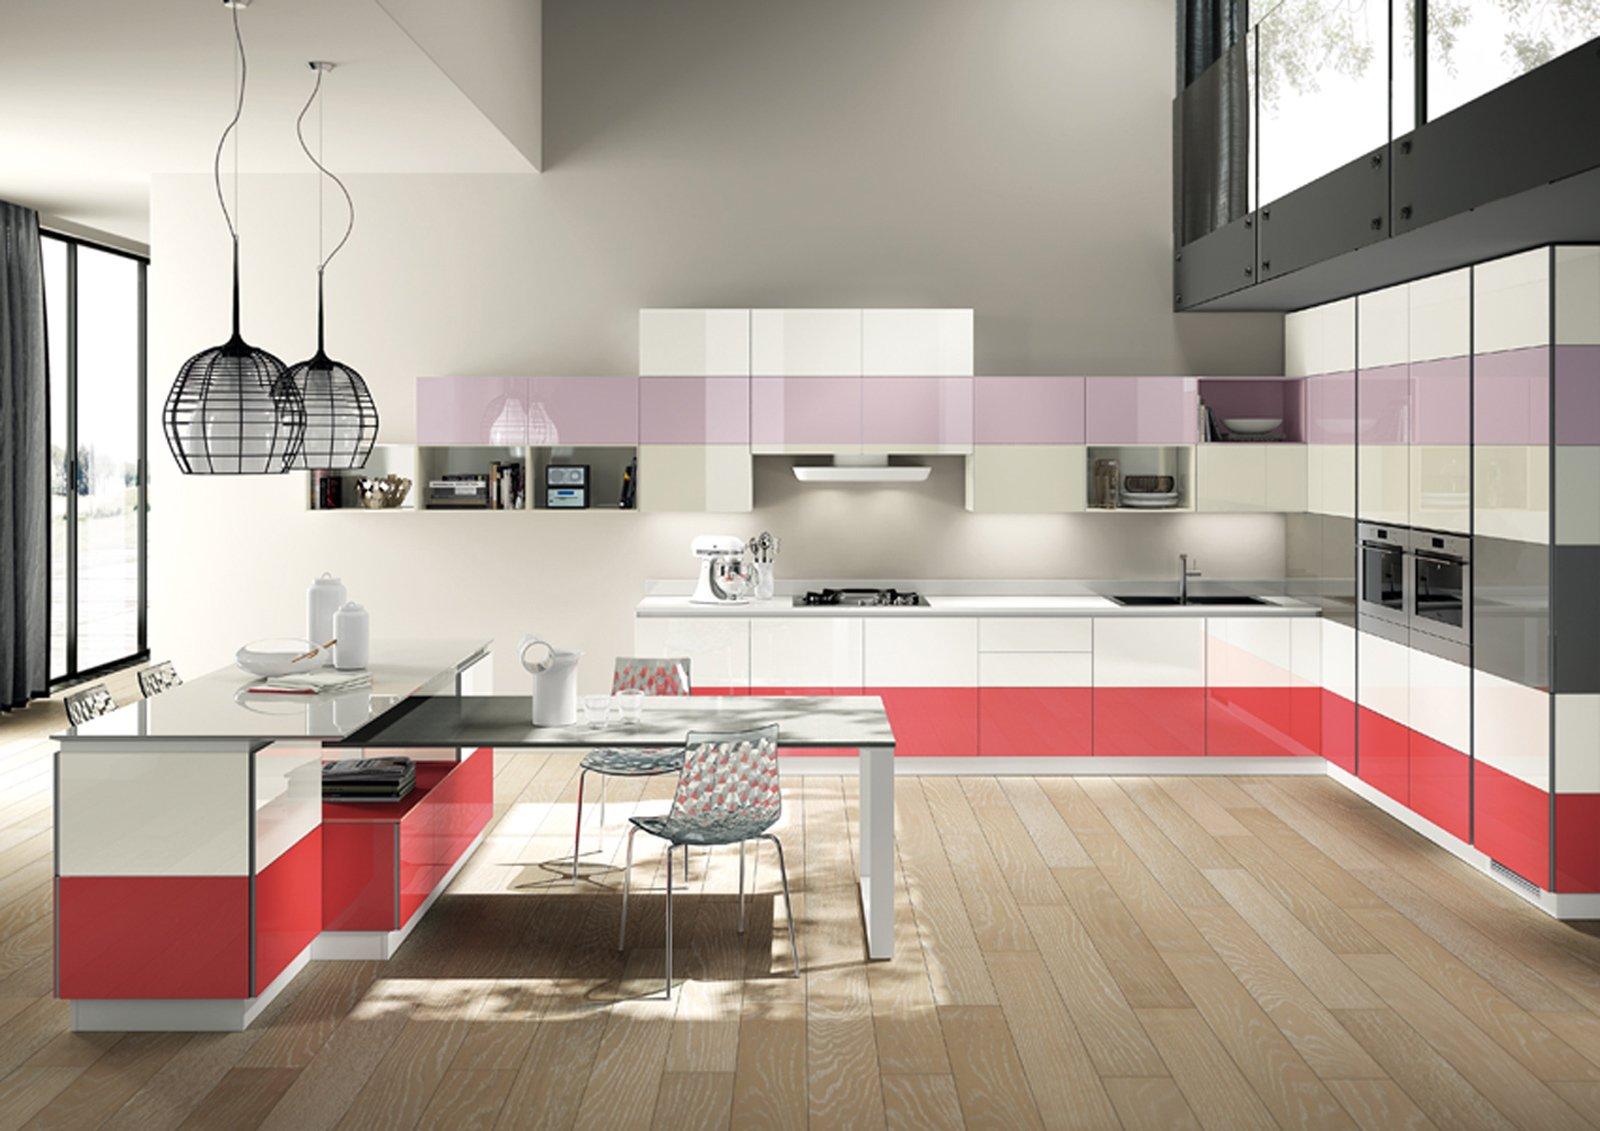 Cucine in vetro con superfici a specchio - Cucine italiane design ...